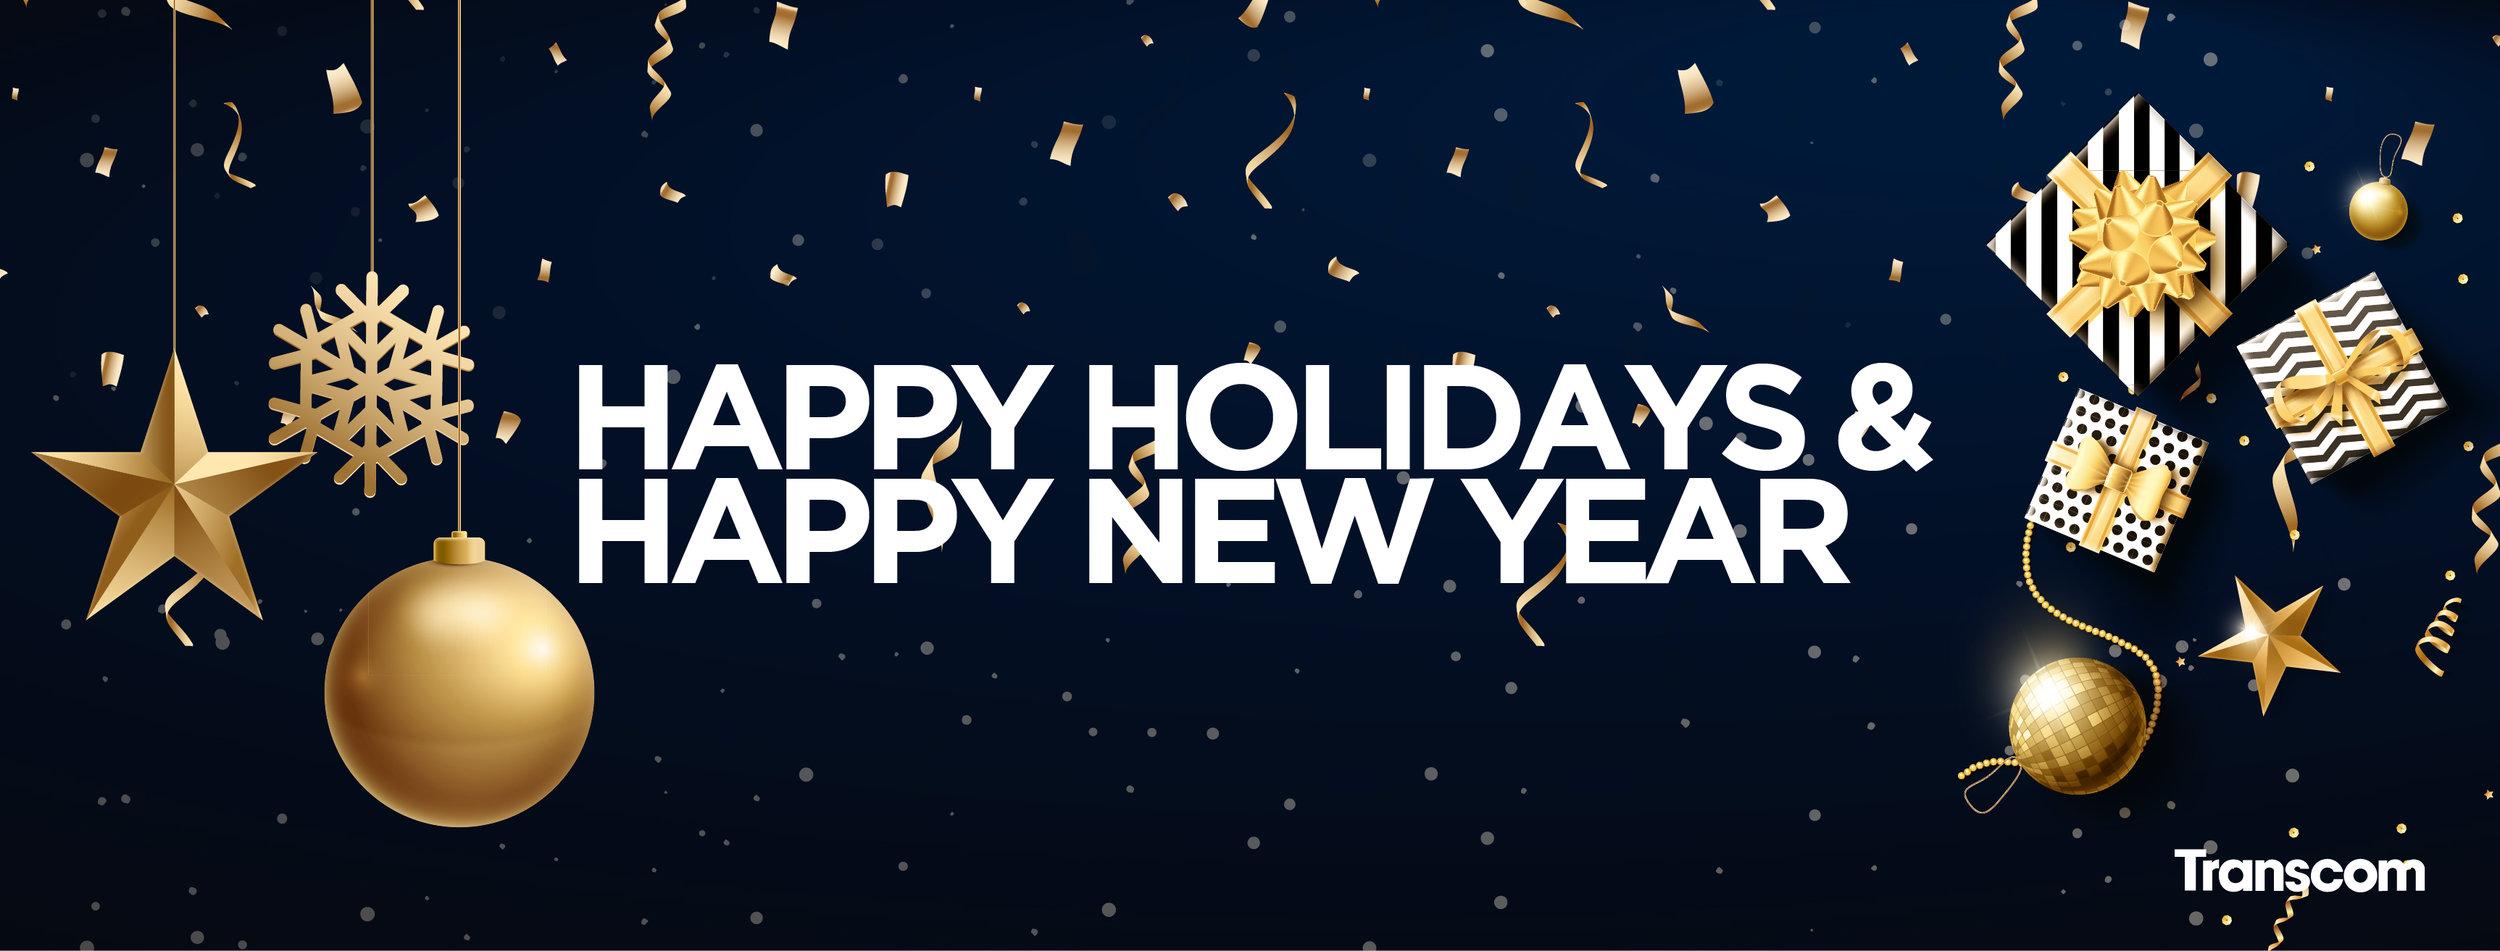 Happy-Holiday-Christmas-assets_English.jpg